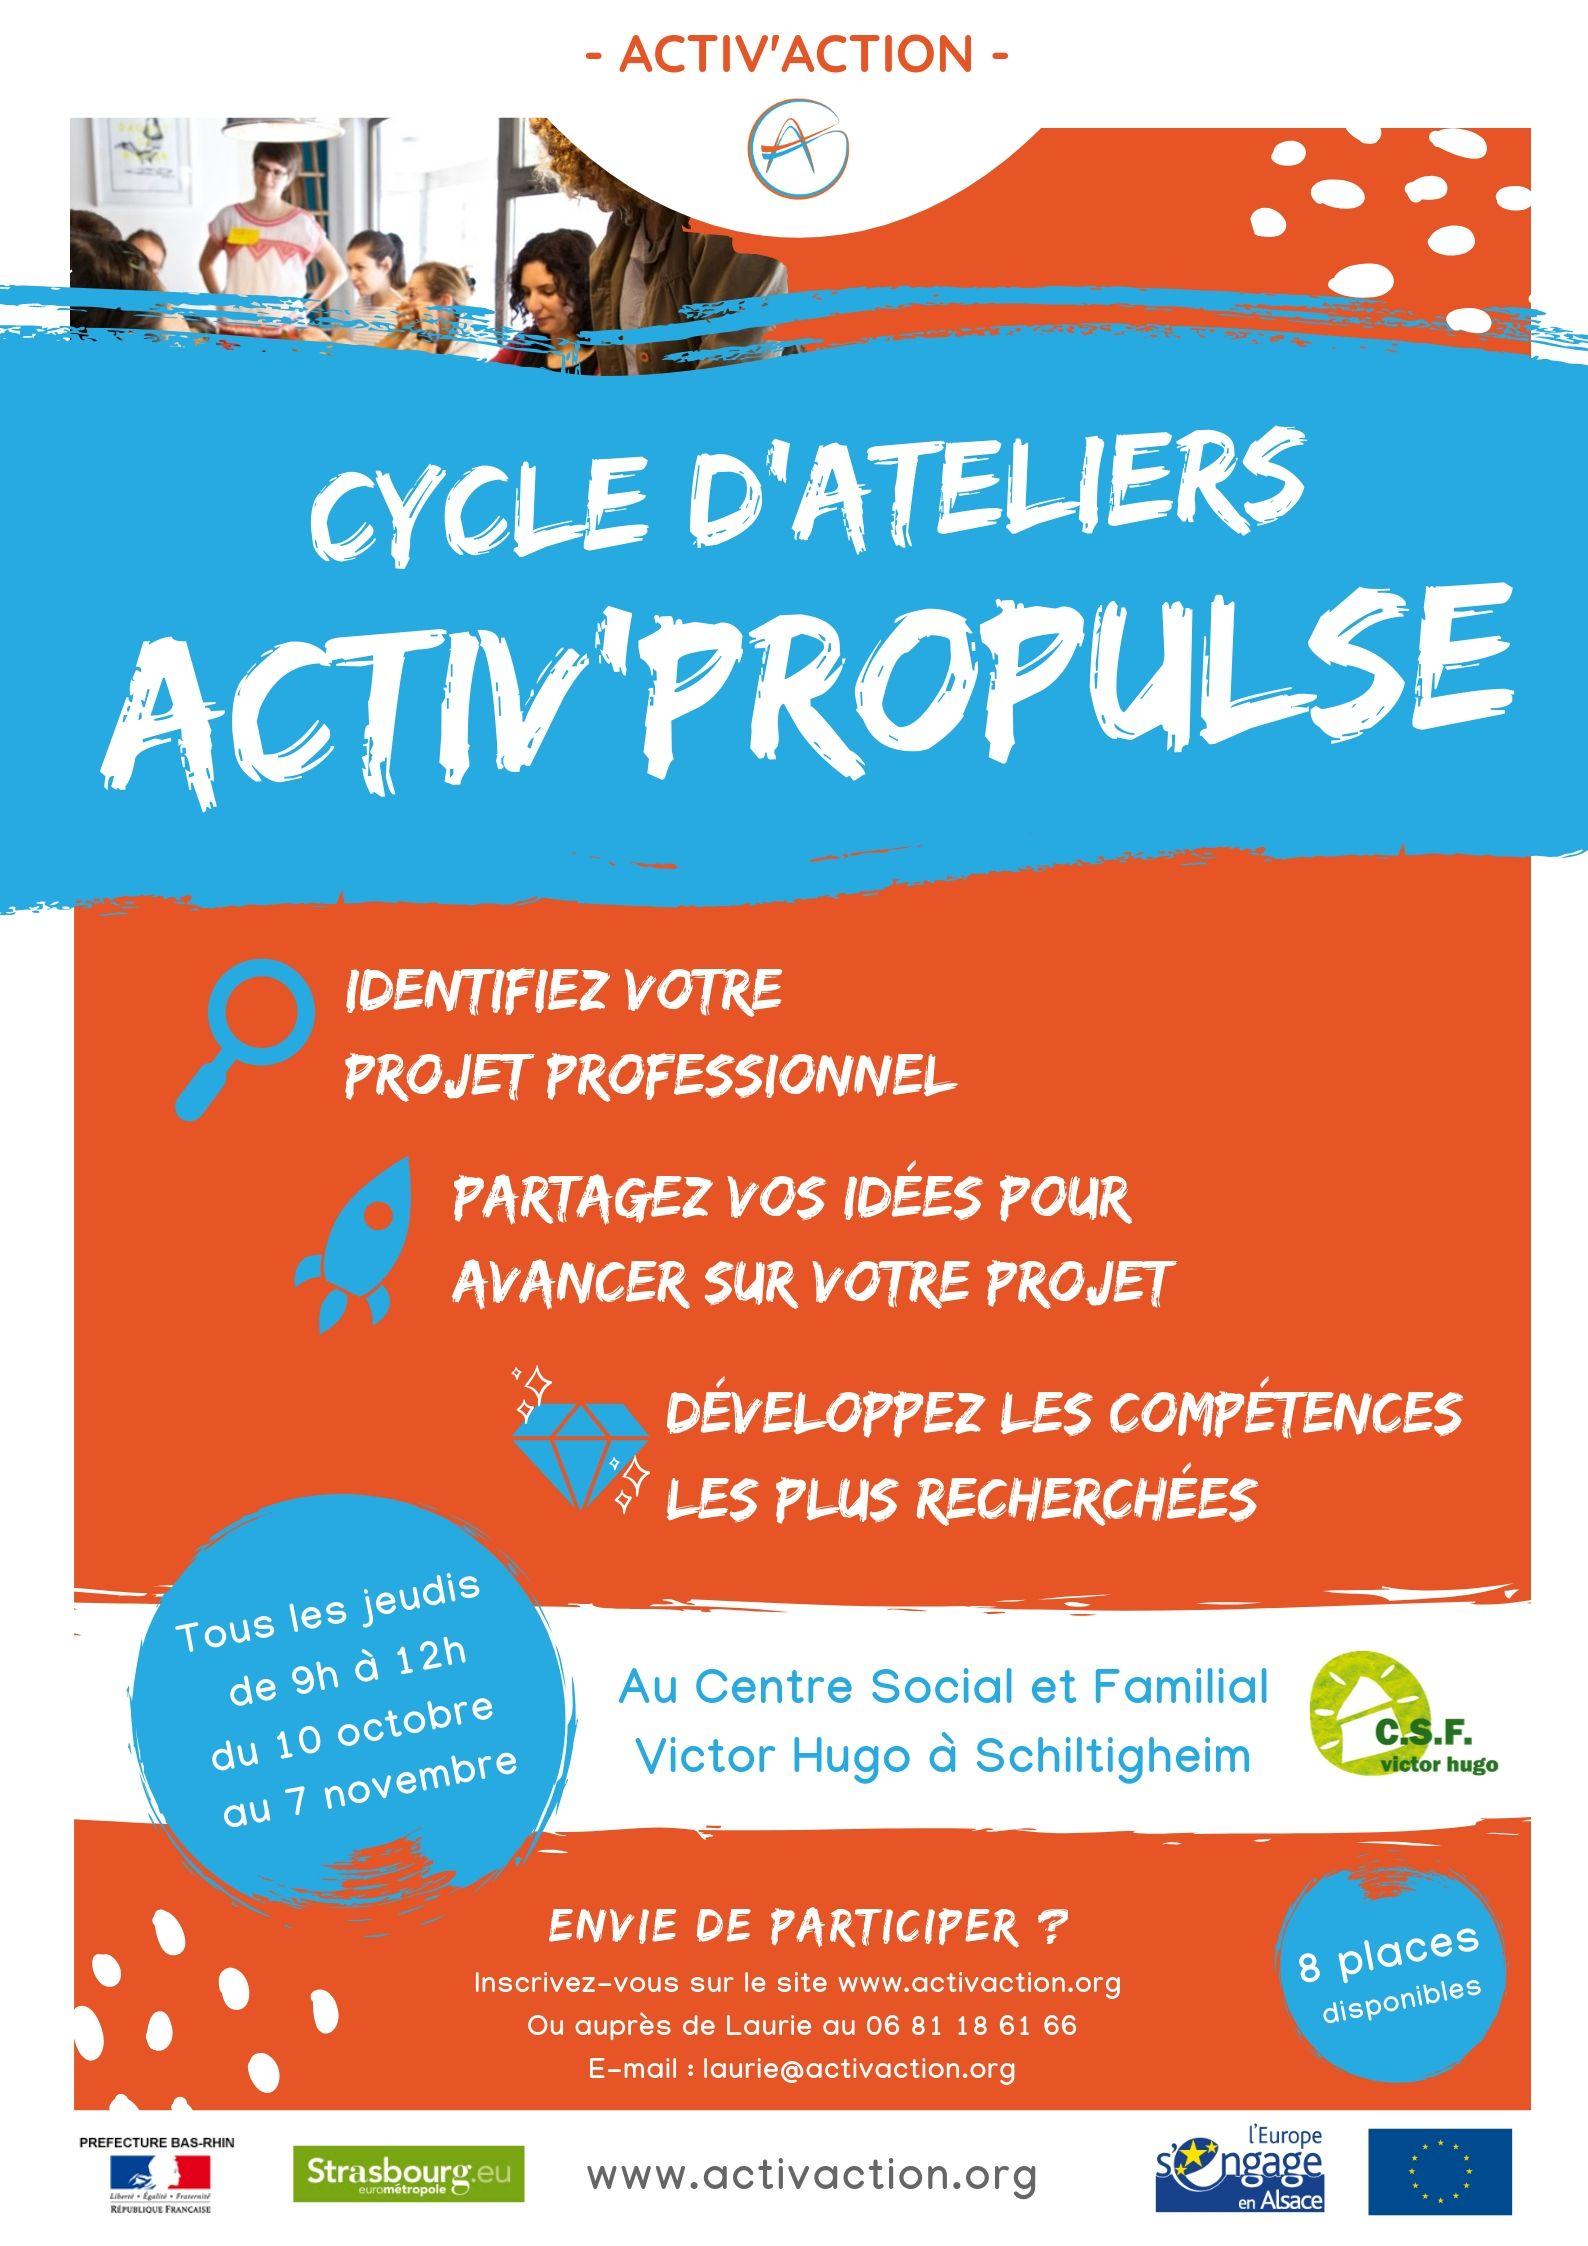 Activ'Propulse - Atelier#4